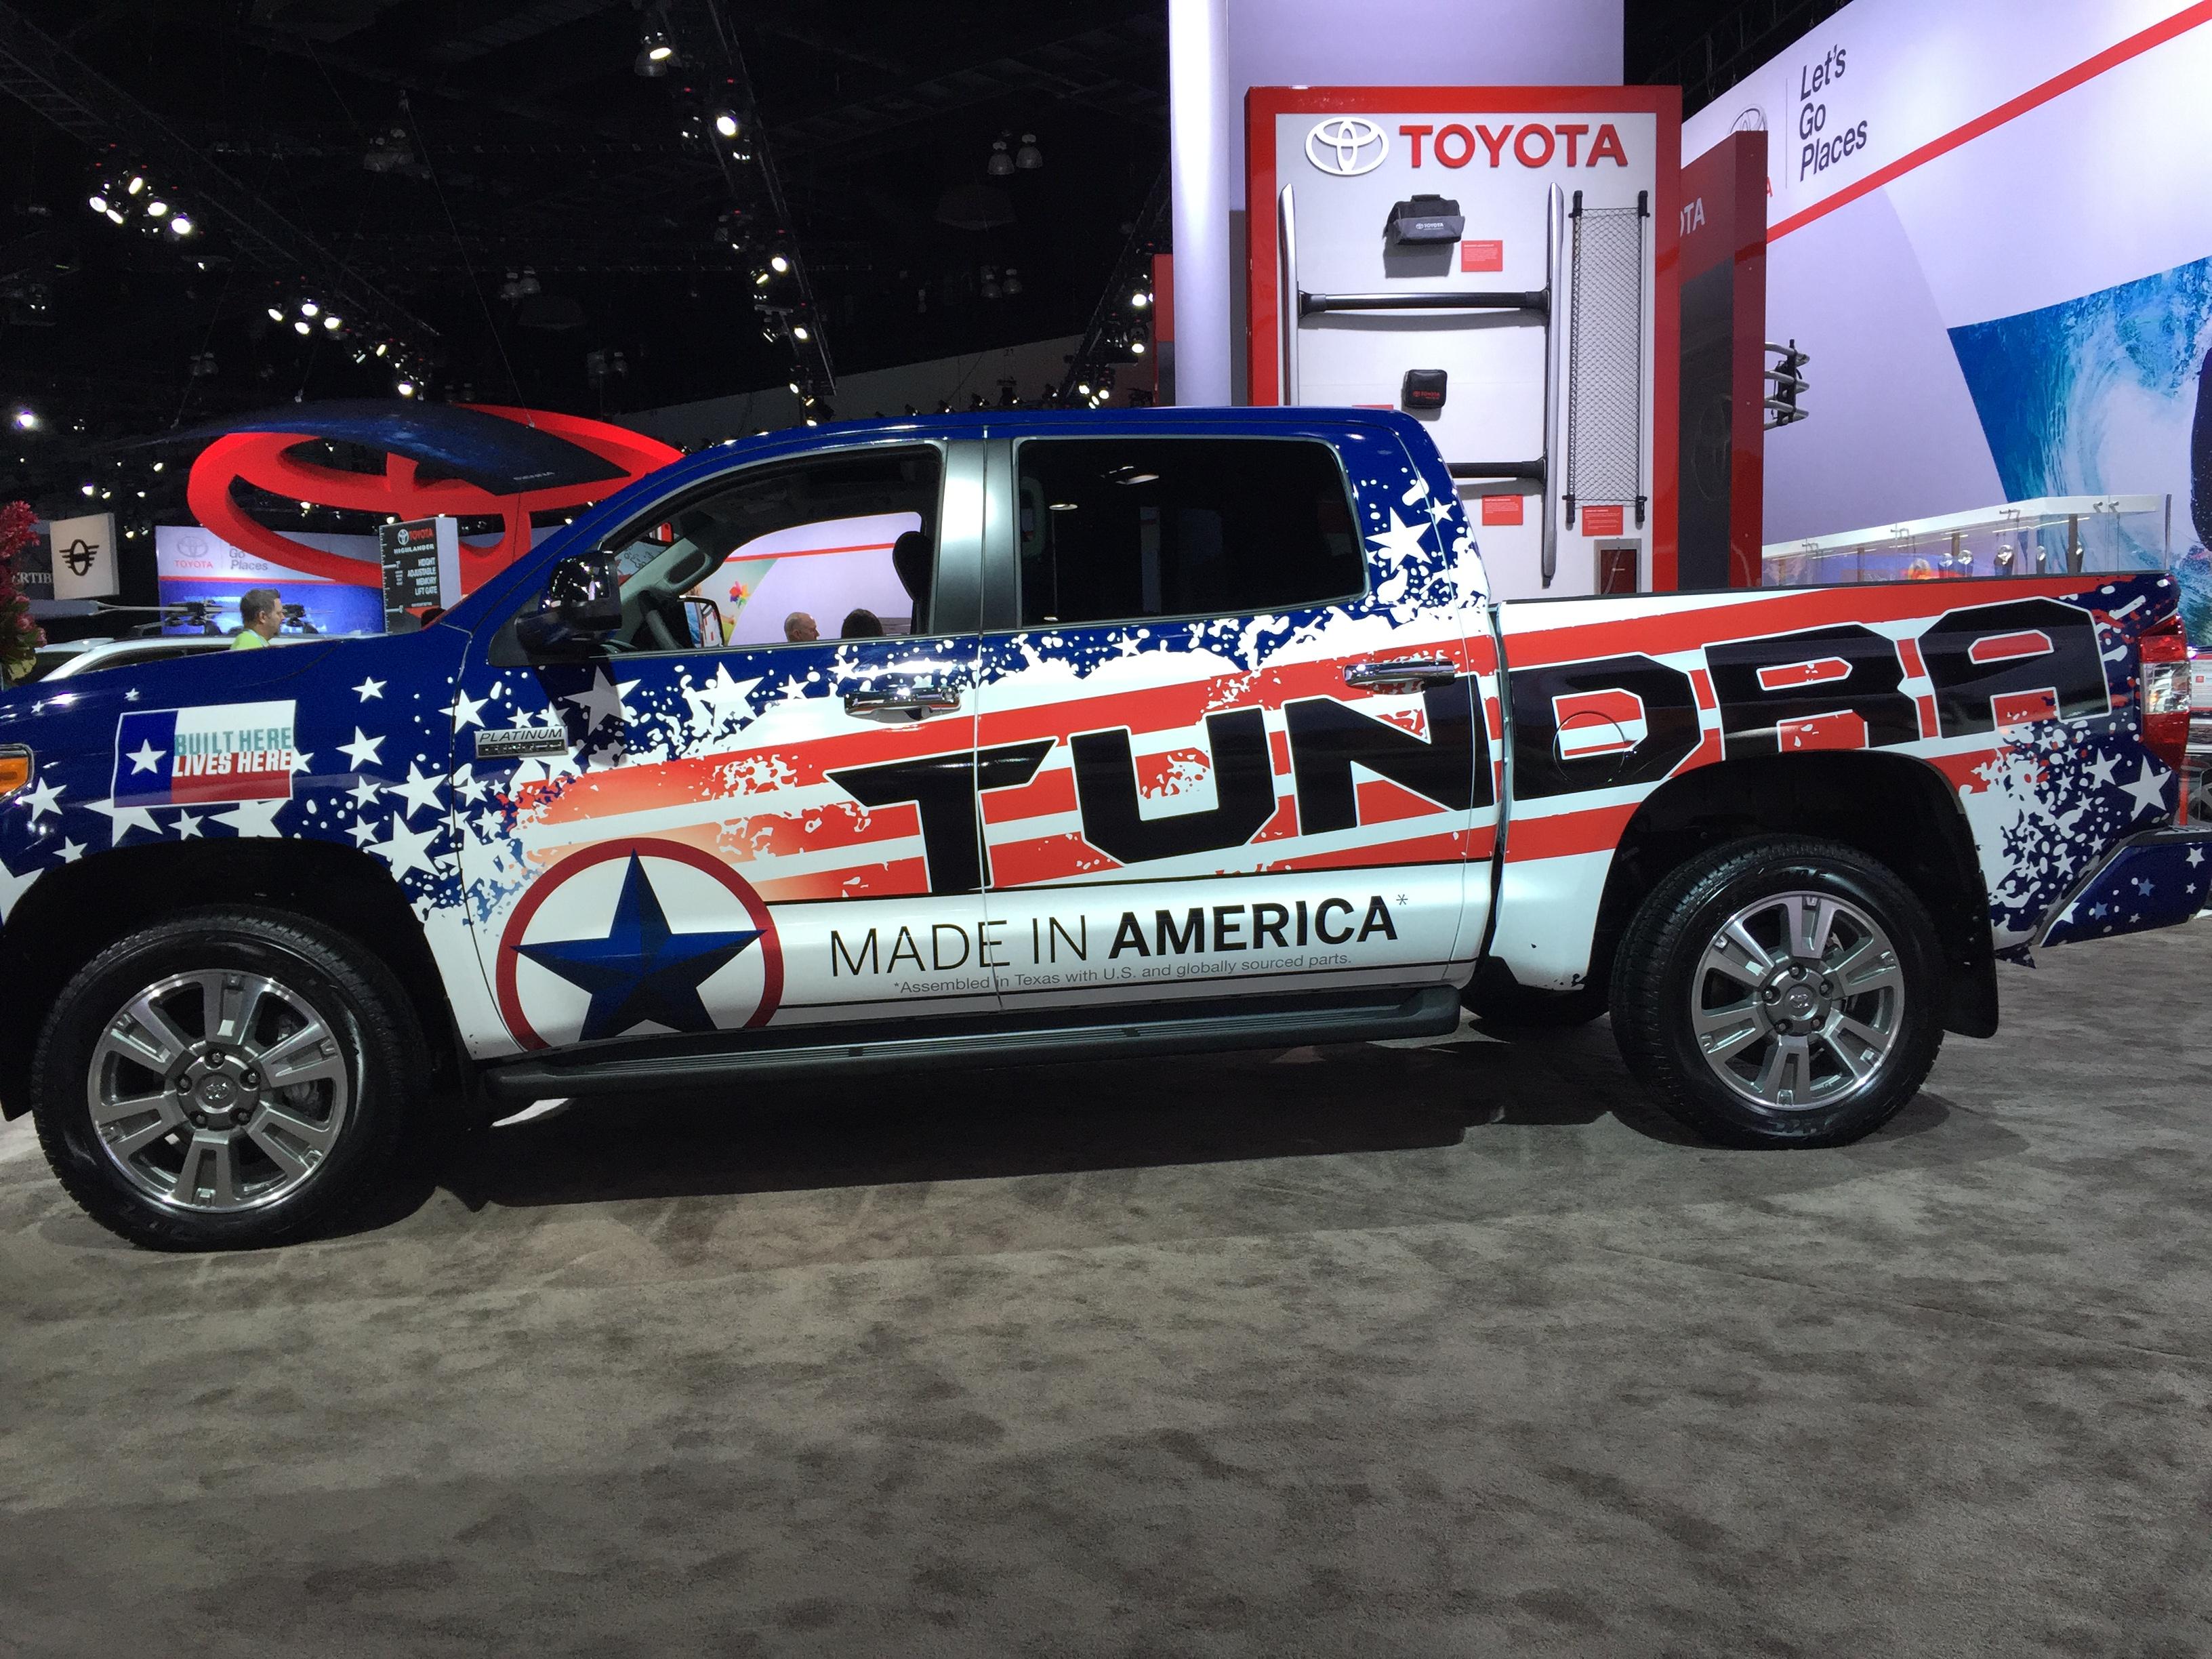 Made in America Tundra « Pomerance and Associates